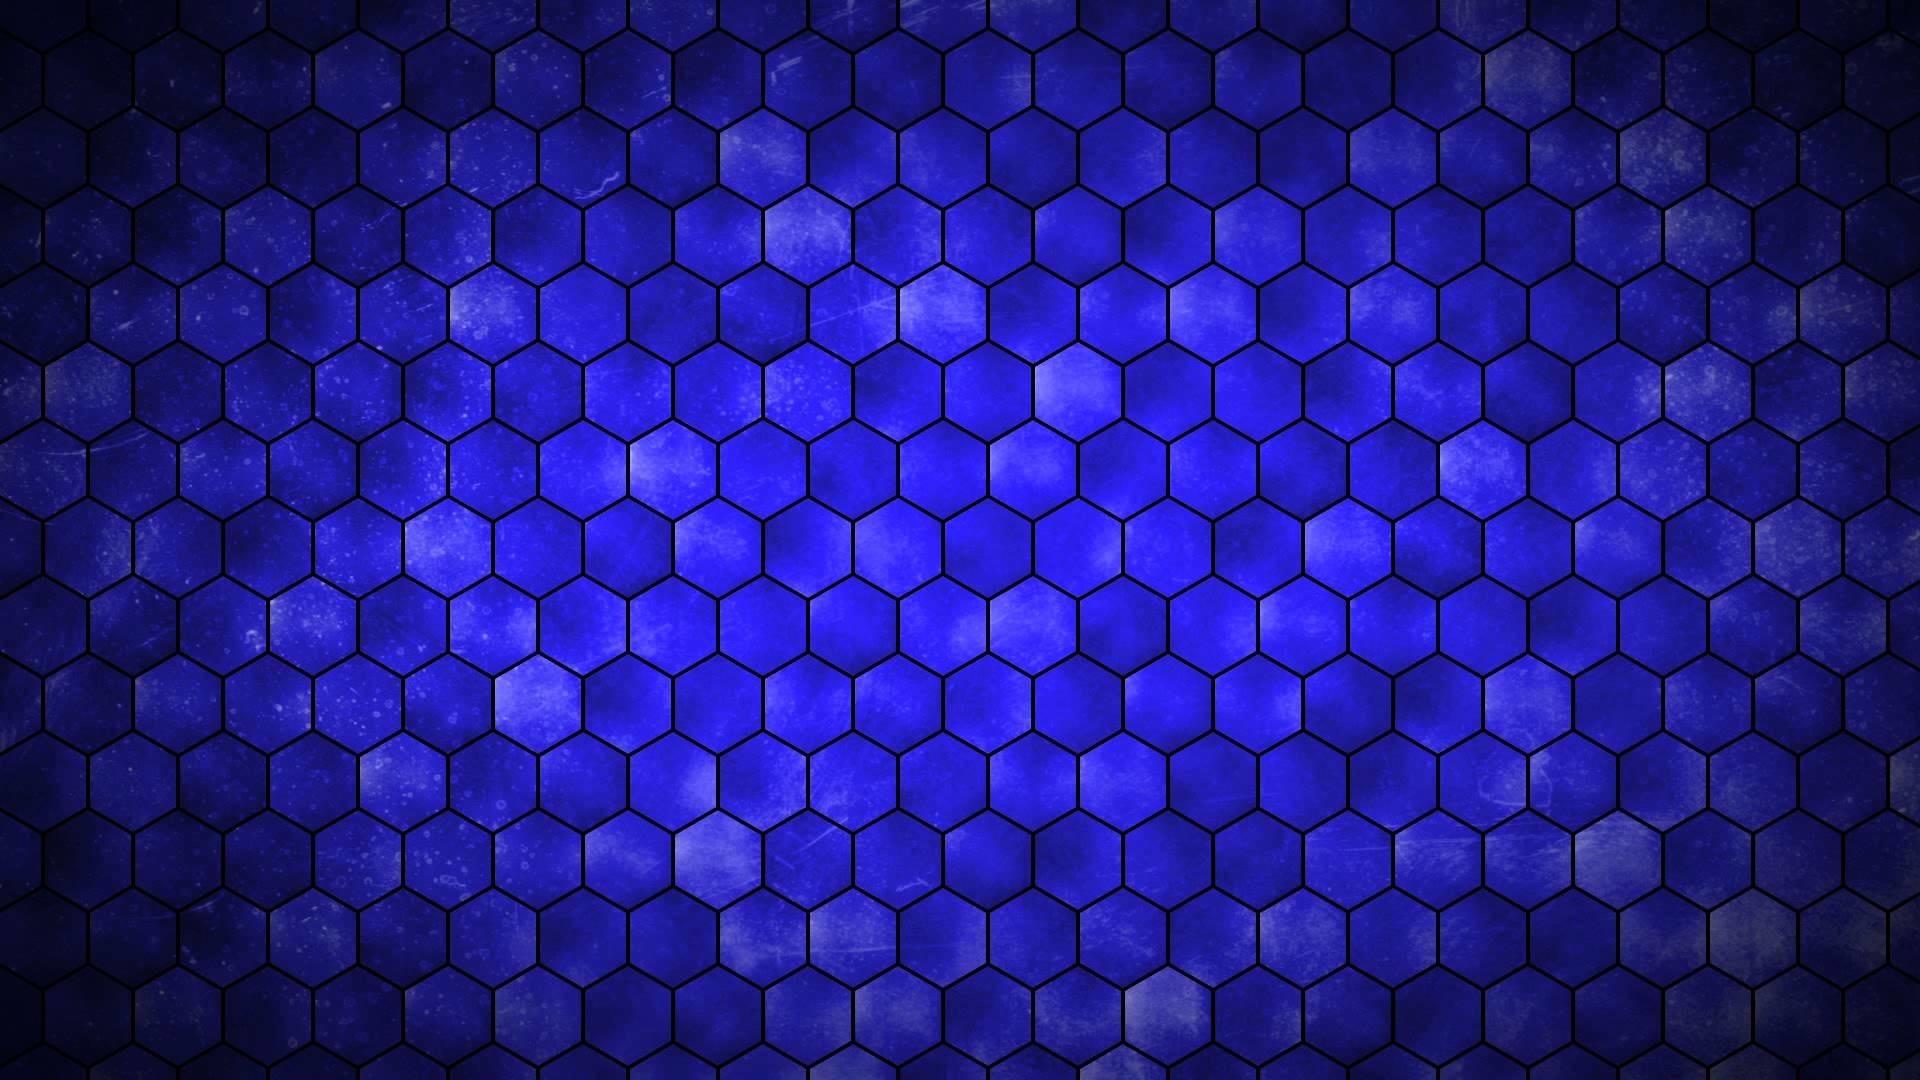 Res: 1920x1080, 1920x1200 Hex wallpapers   Hex stock photos Hexagon Wallpaper 24872 -  Baltana .